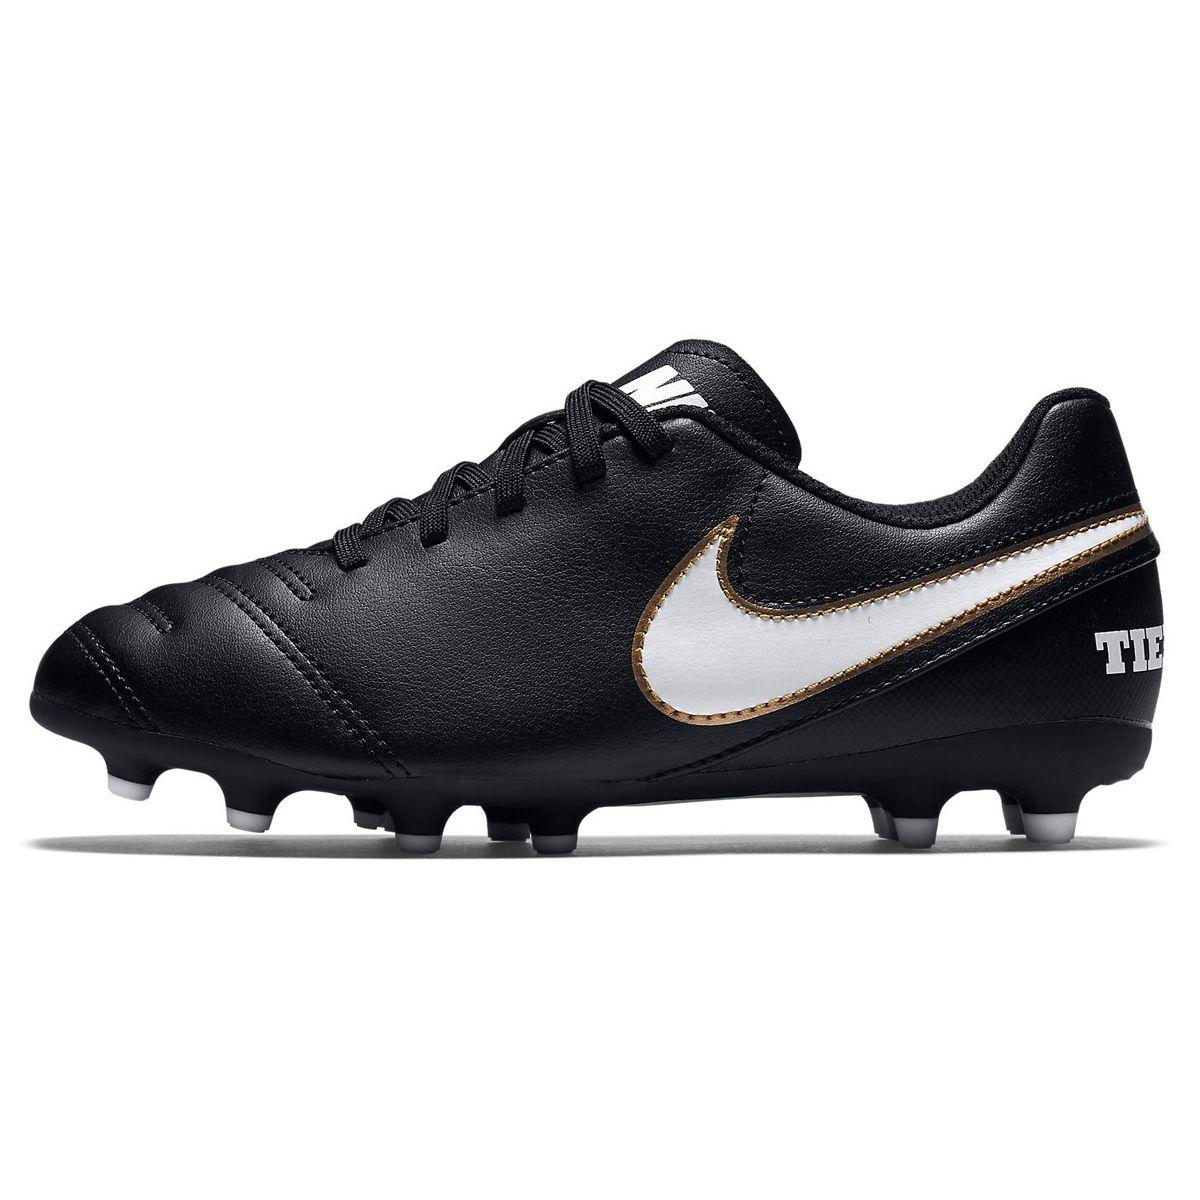 1da46853699 Nike Jr Tiempo Rio Iii Fg Çocuk Krampon 819195010 - Futbol Ayakkabıları